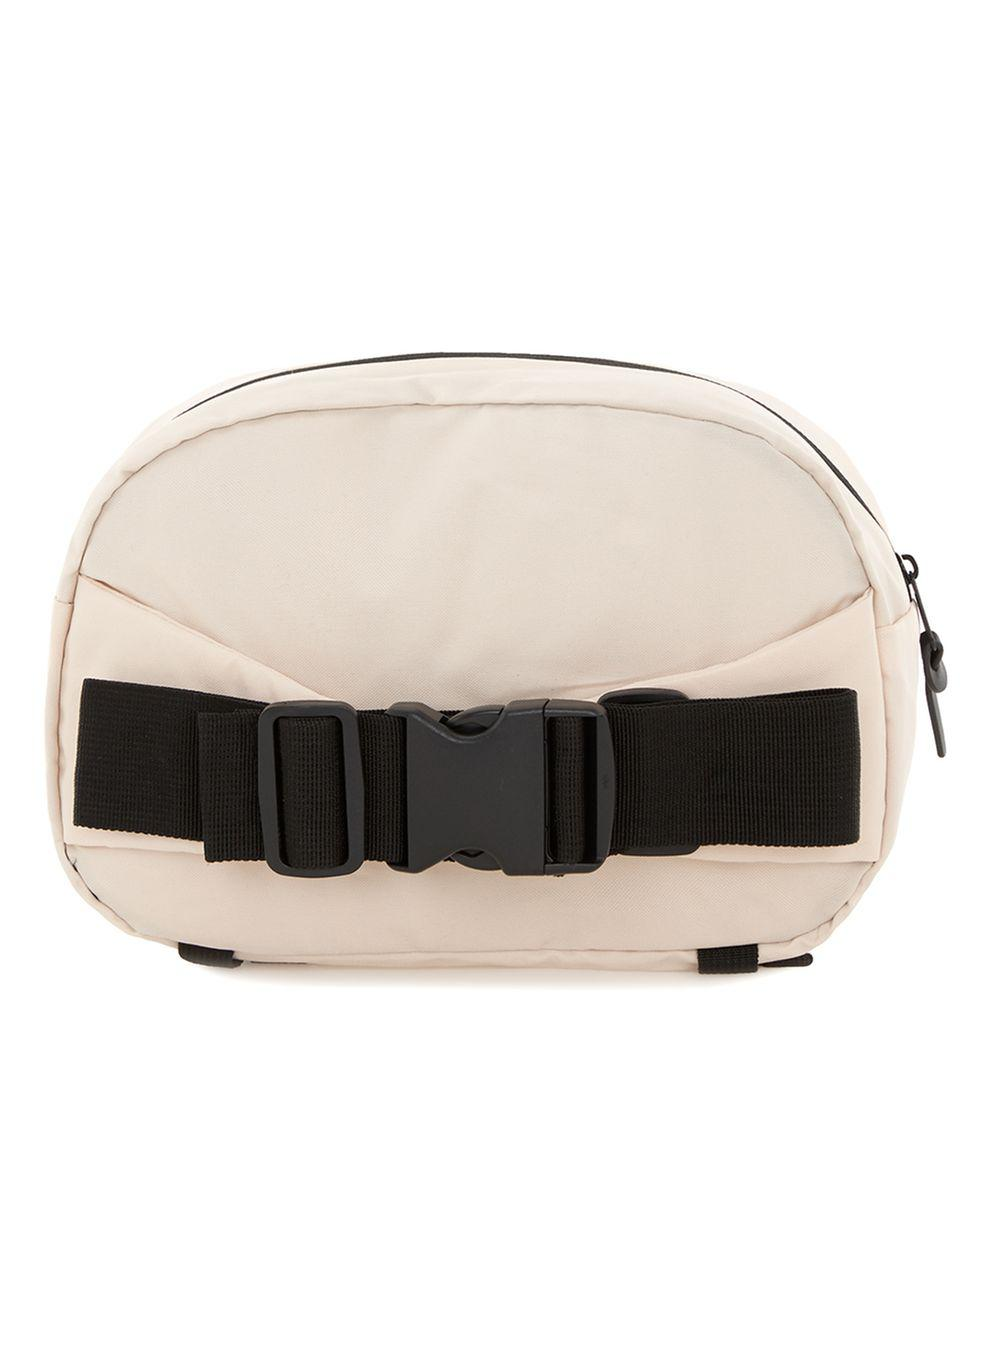 TOPMAN Synthetic Tone Cross Body Bag in Stone (Black) for Men